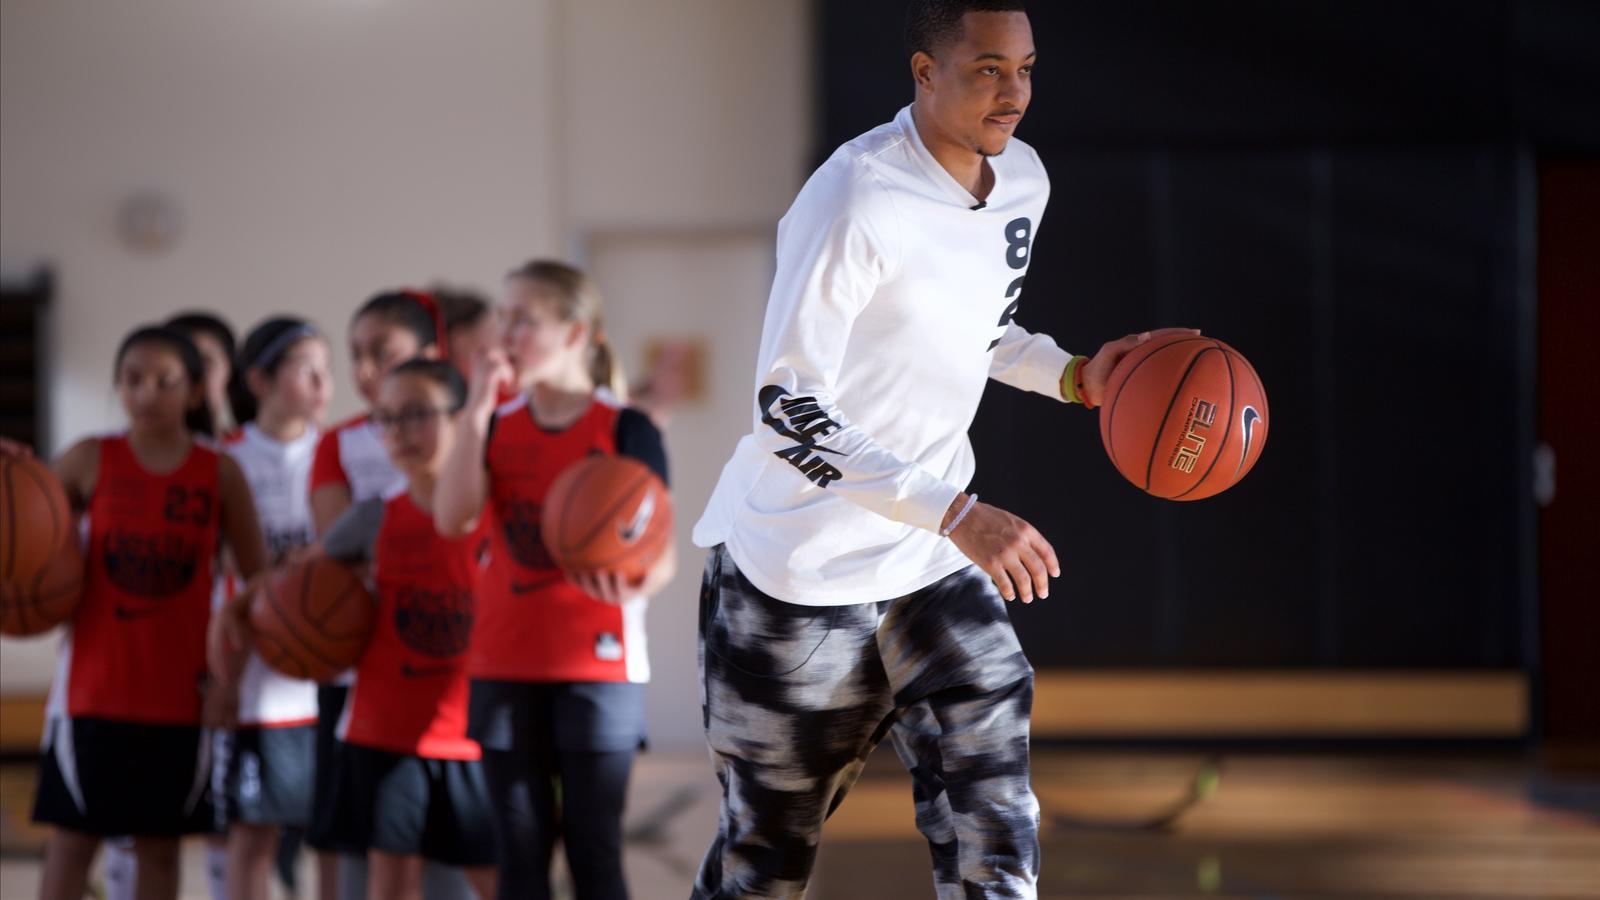 Nike and the Portland Trail Blazers